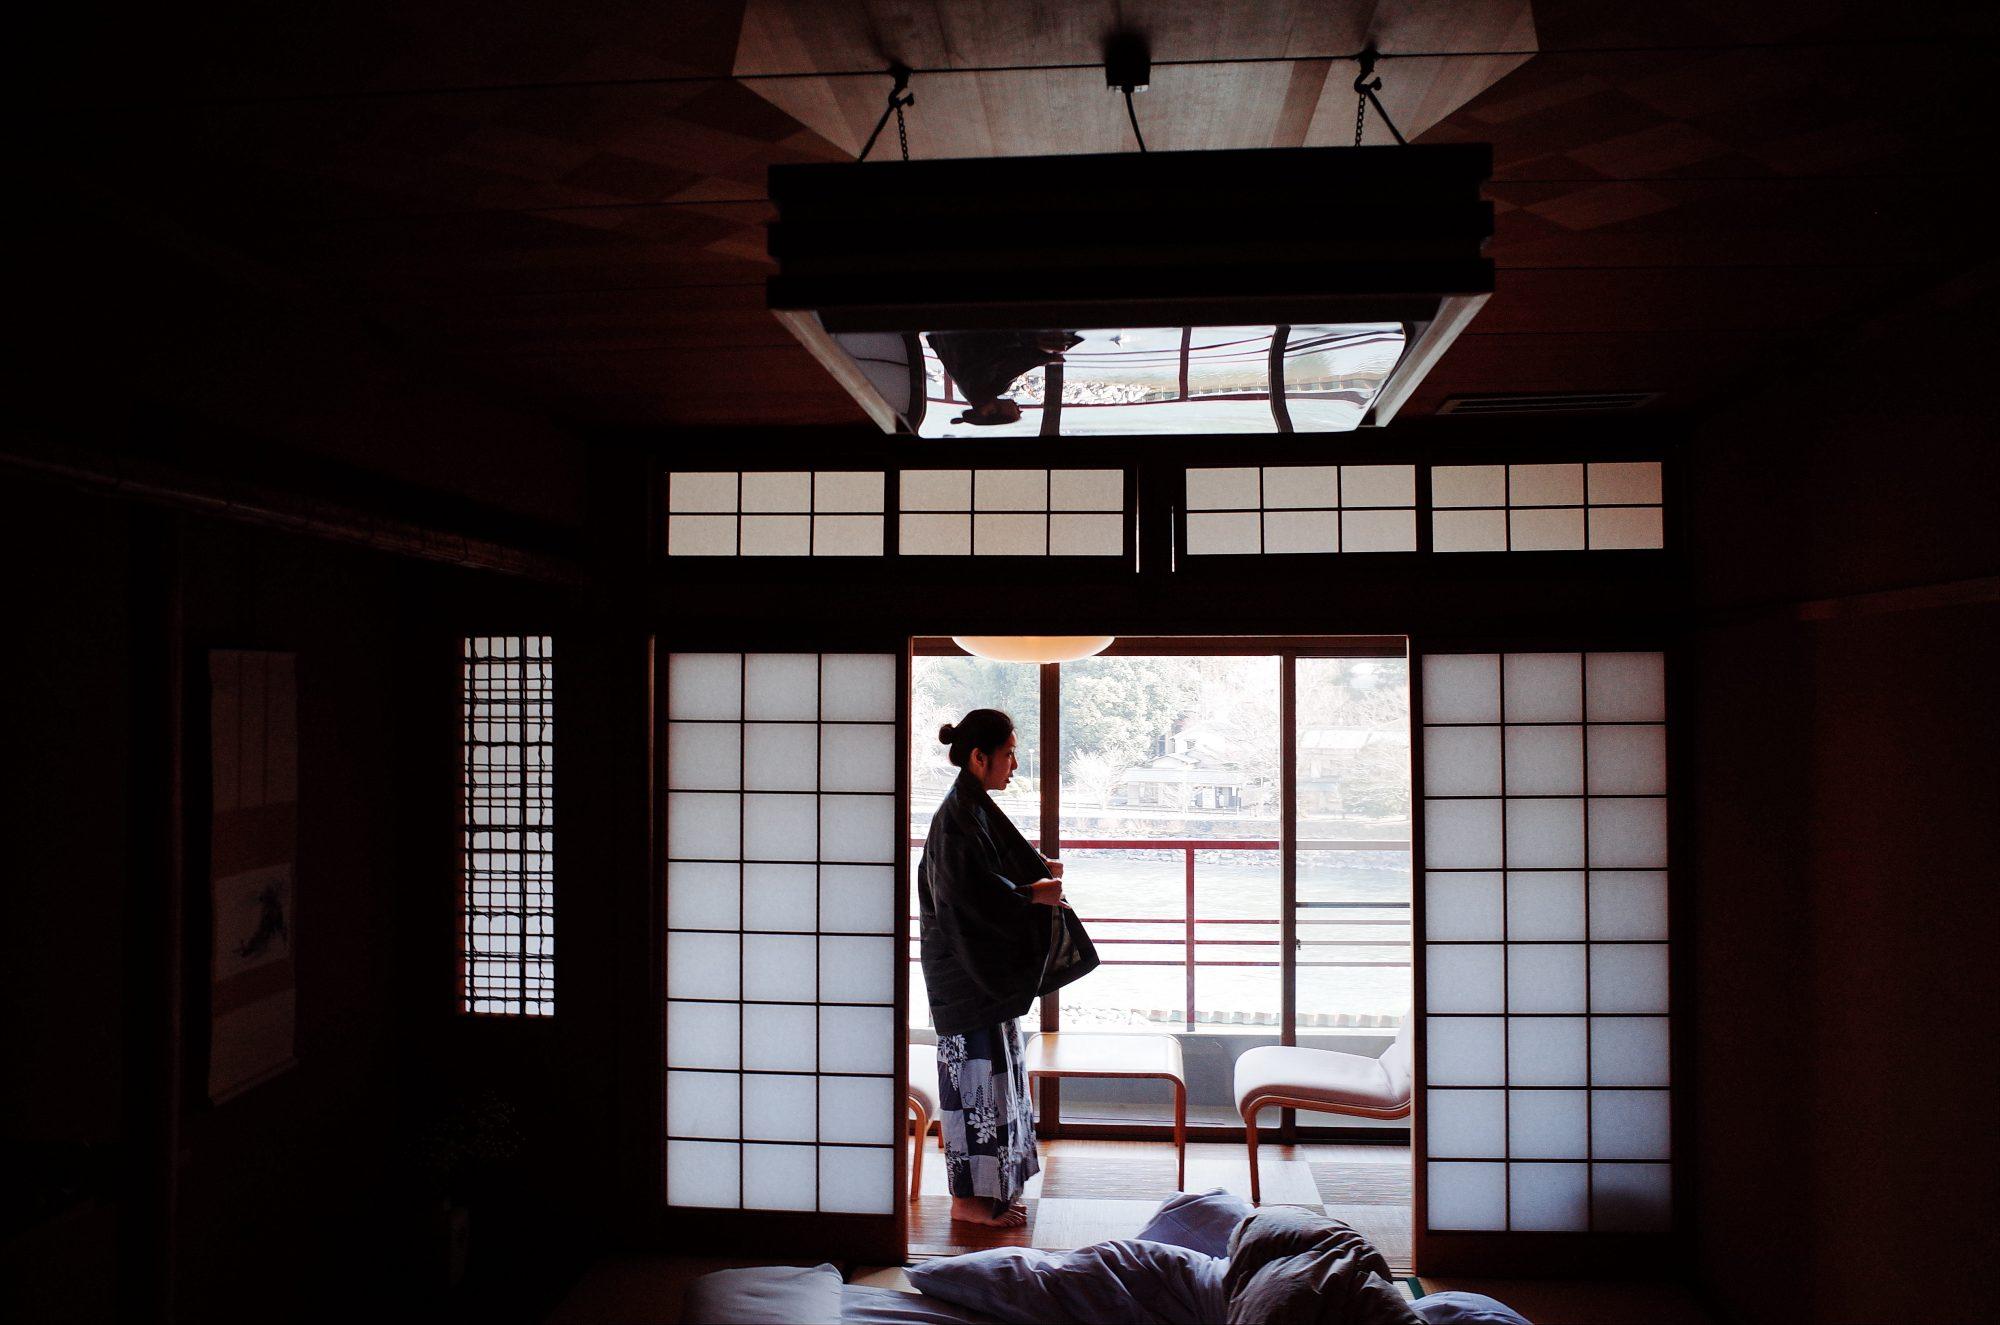 Uji/Kyoto Ryokan #cindyproject